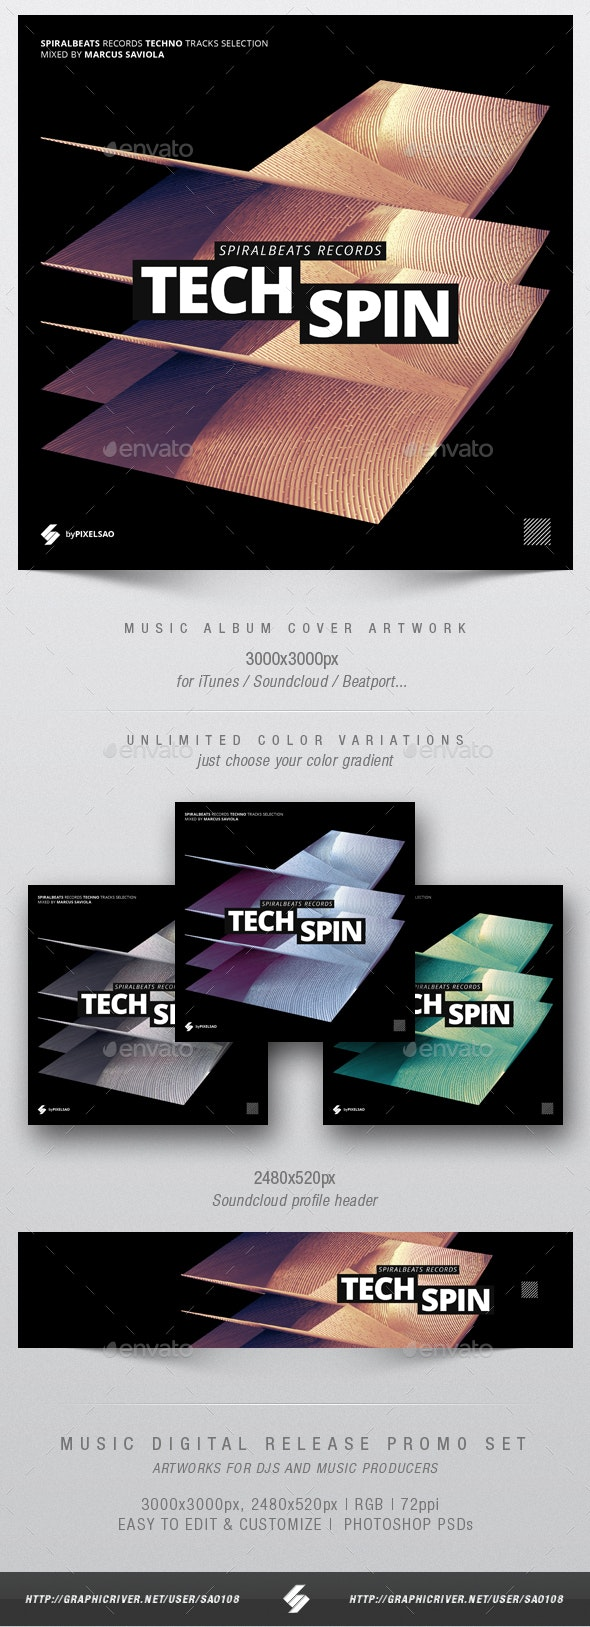 Techspin - Music Album Cover Artwork Template - Miscellaneous Social Media